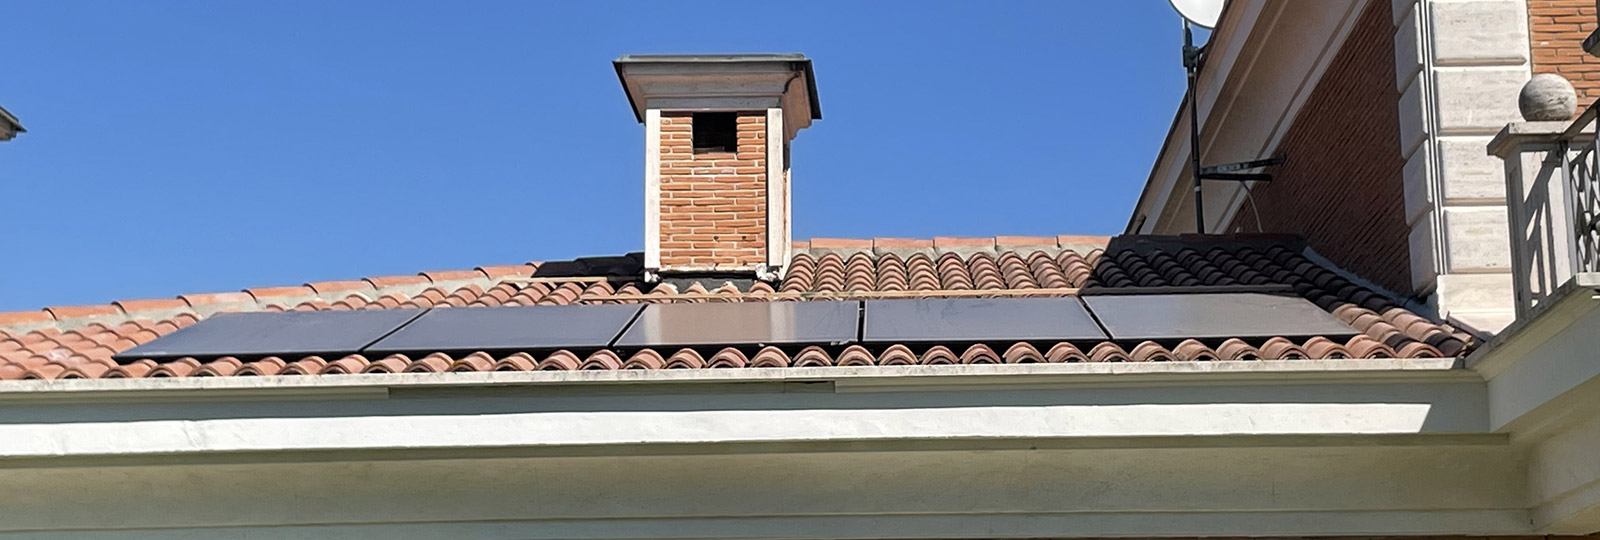 Solare-termico-Nastasi-Impianti-Tecnologici